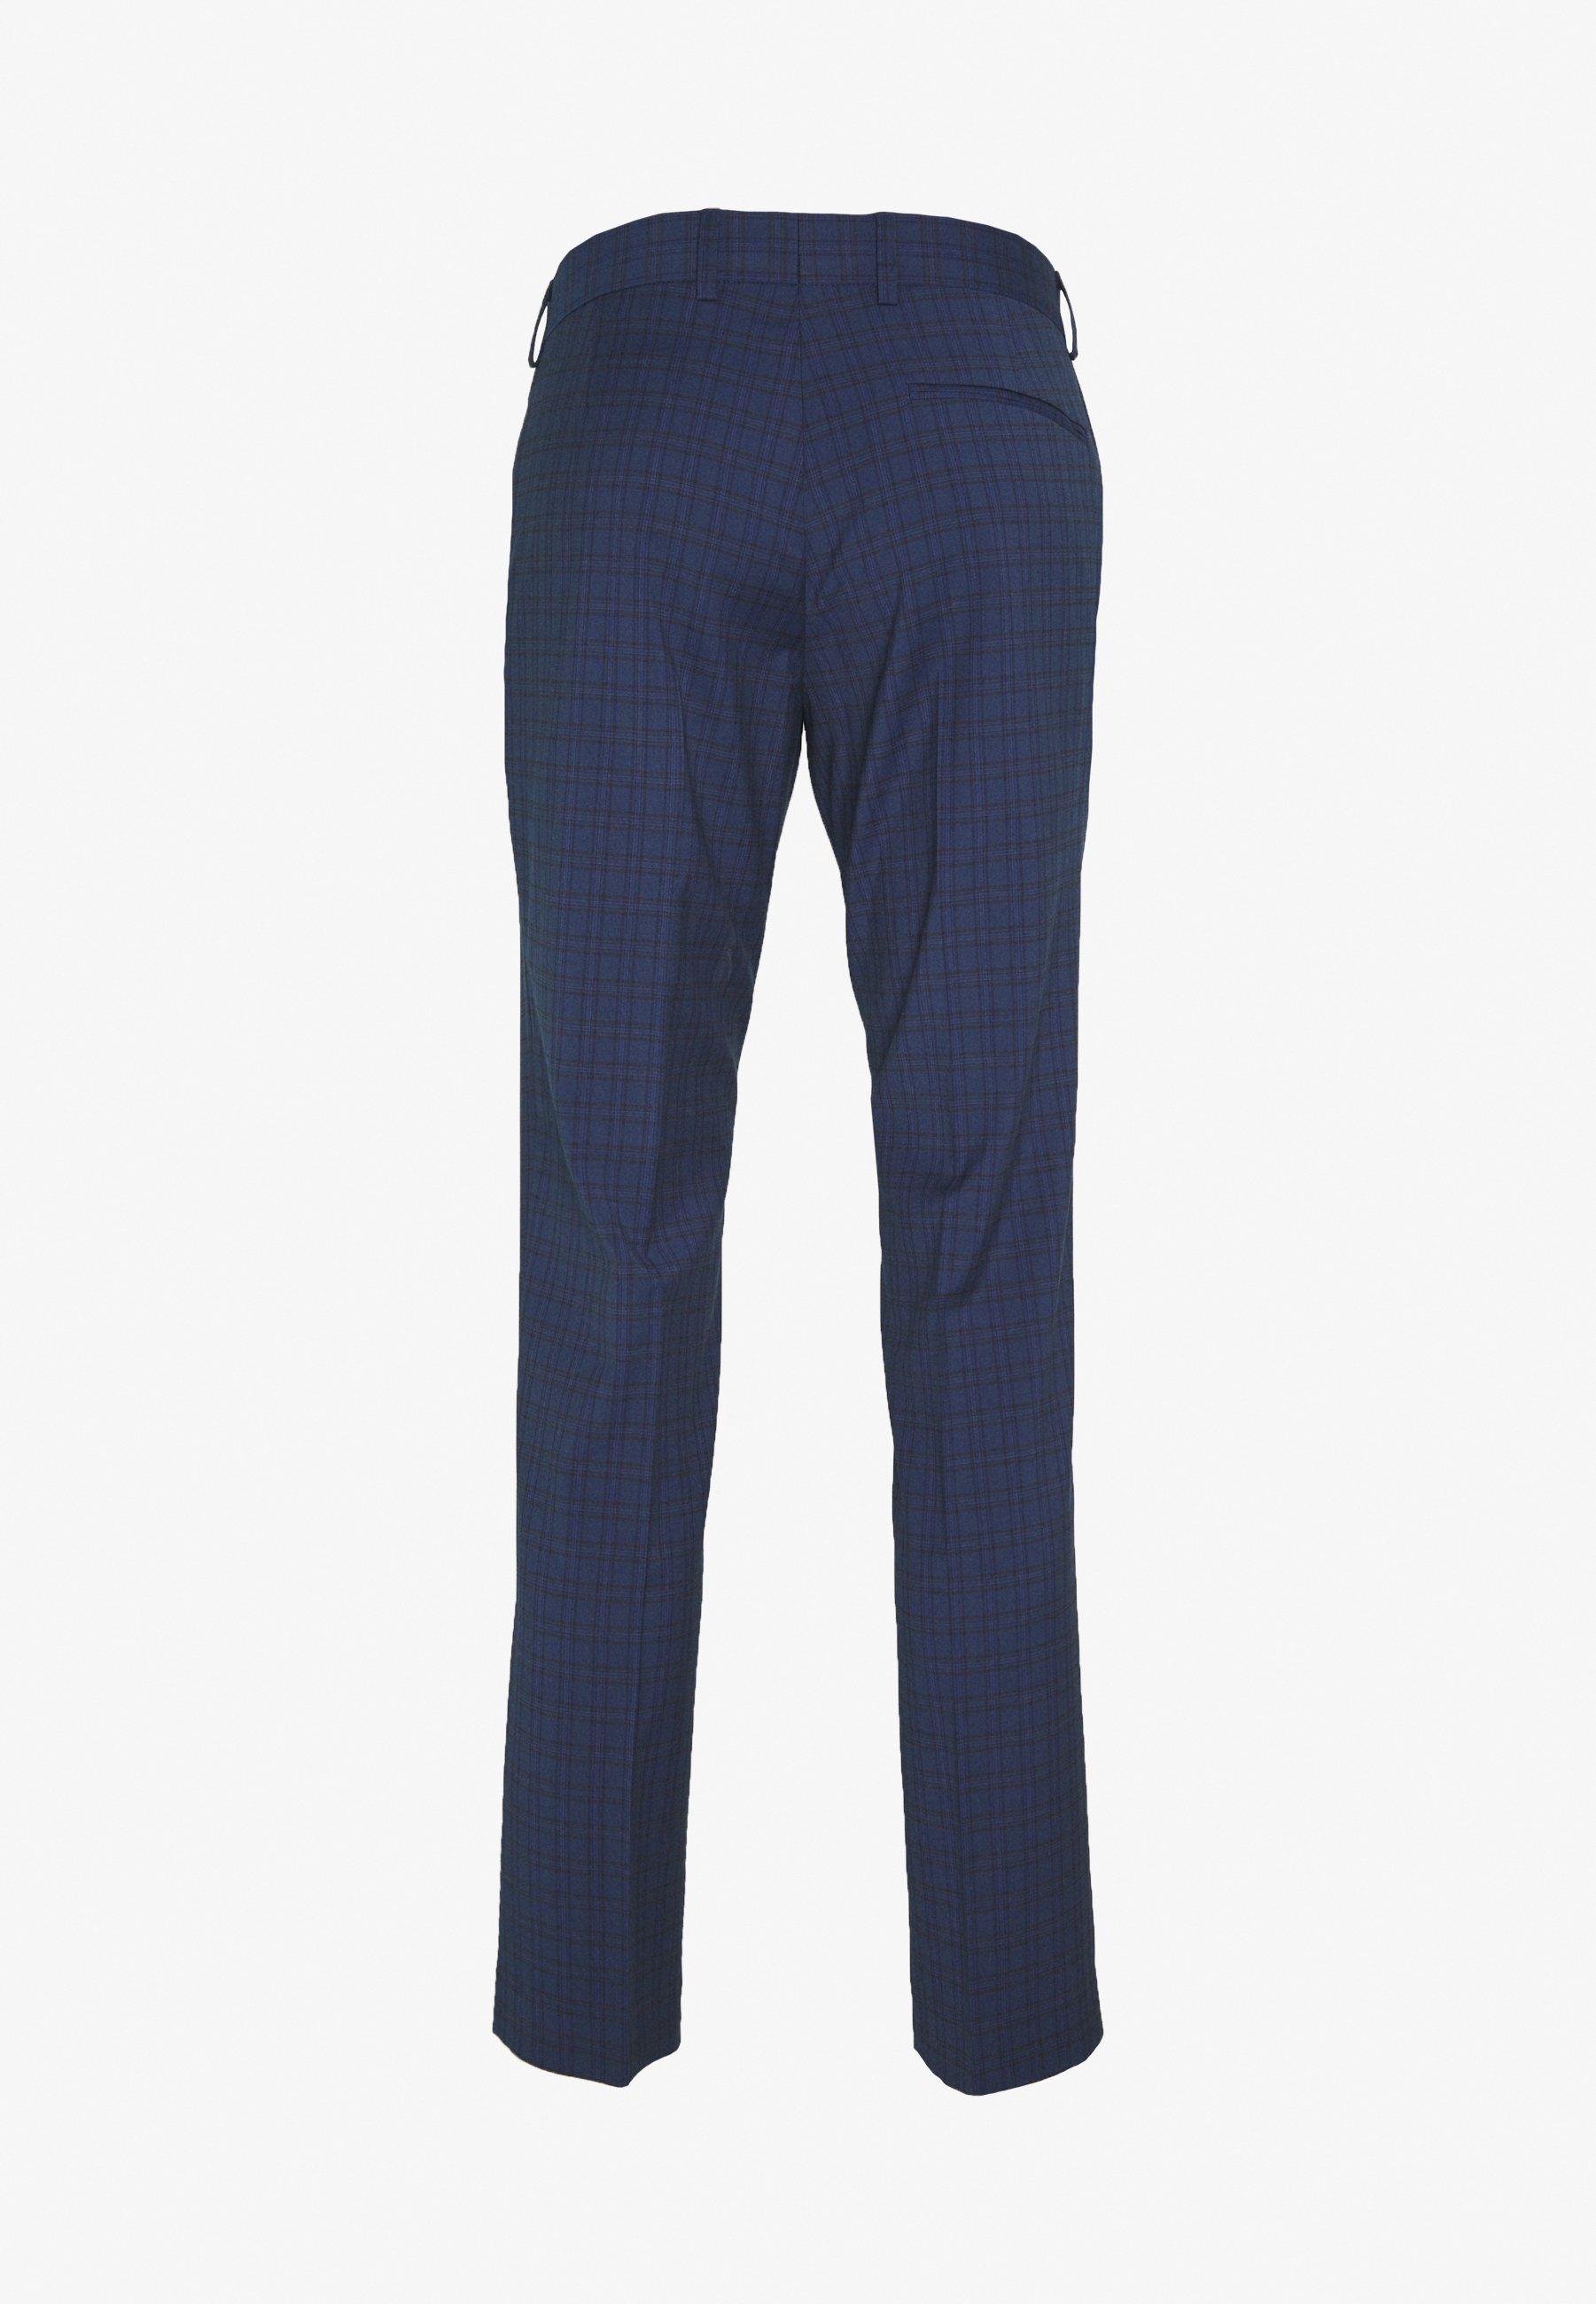 2020 Unisex Miesten vaatteet Sarja dfKJIUp97454sfGHYHD Isaac Dewhirst CHECK TUX Puku dark blue